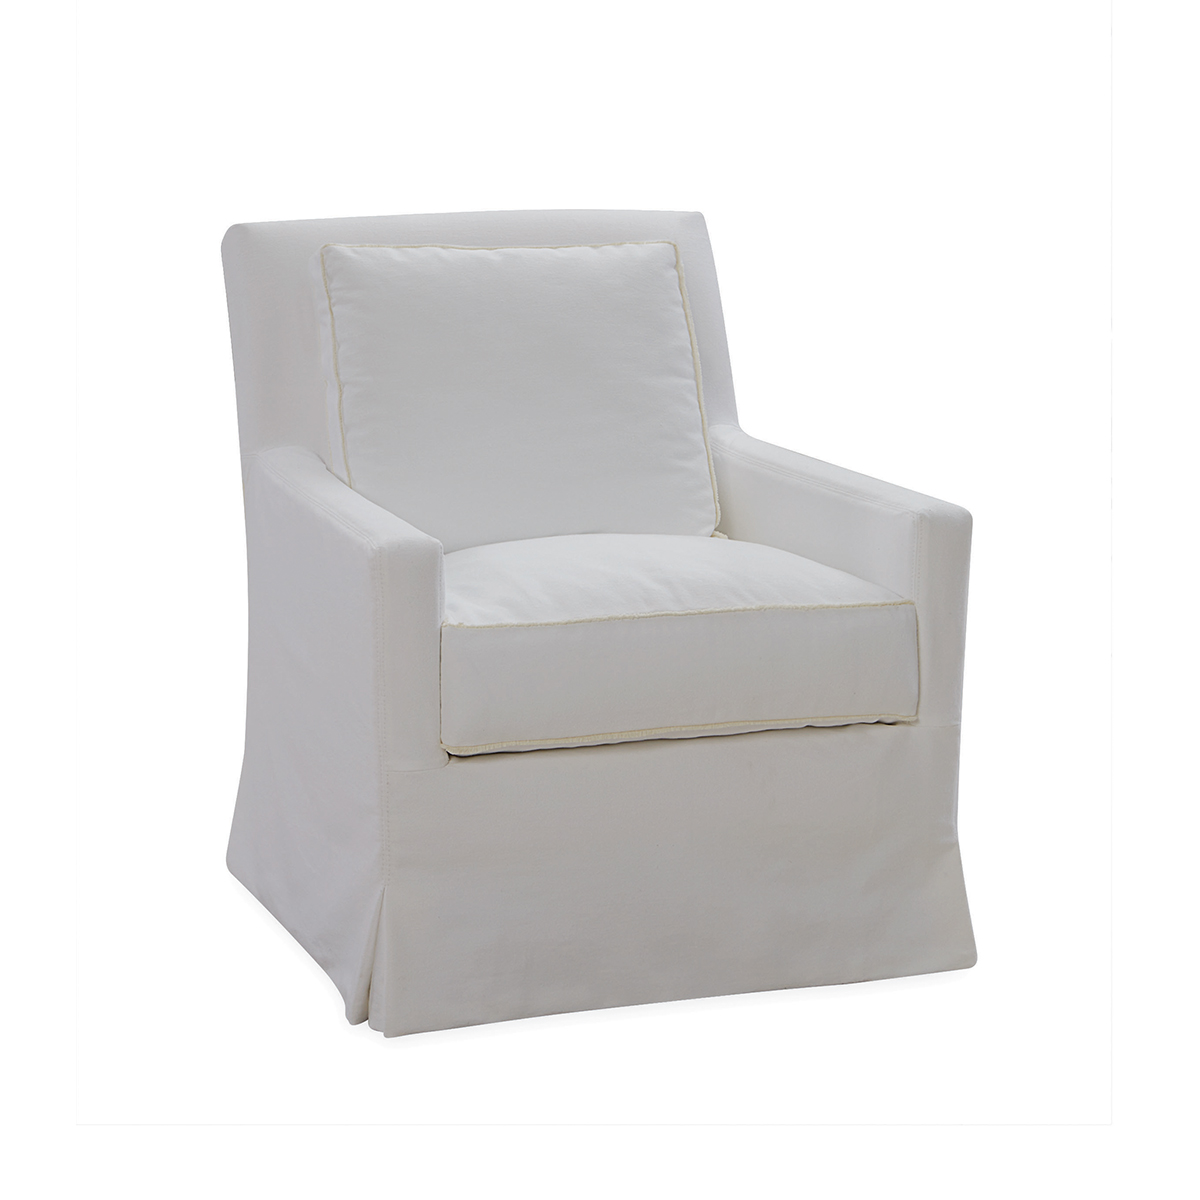 3907_Slipcovered_Chair_white_Lee_Industries.jpg